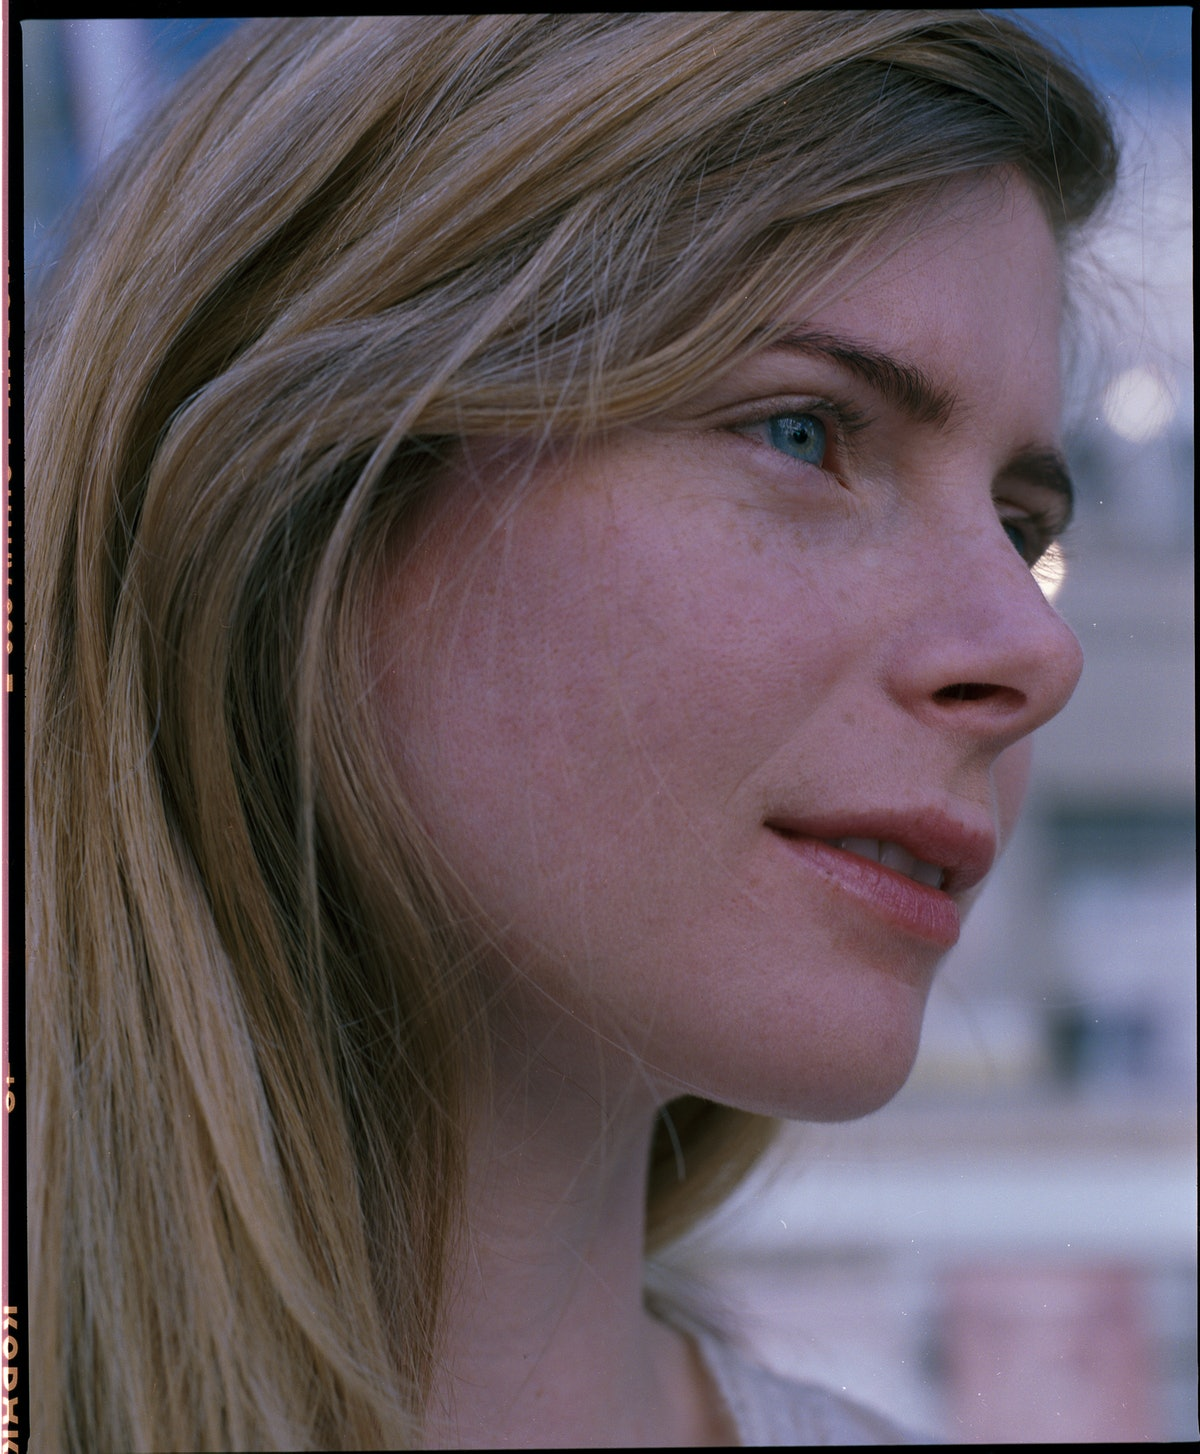 Emma Cline